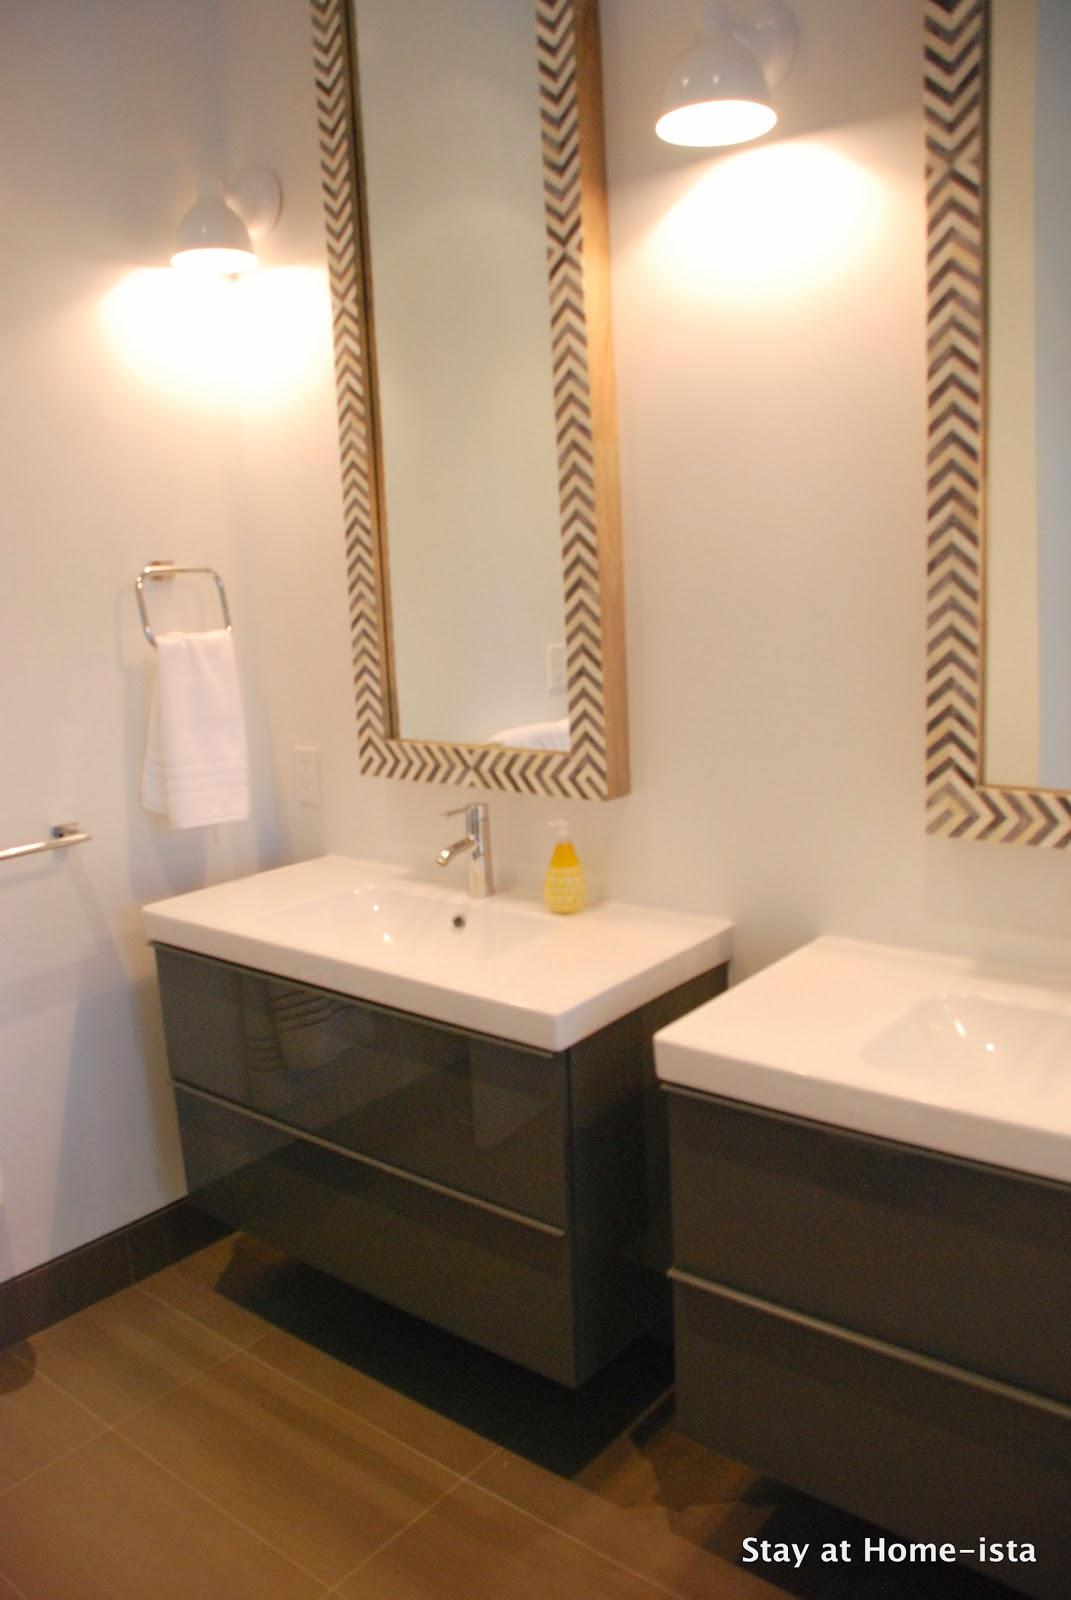 Inspirational Modern grey and white bathroom with Ikea vanities and herringbone mirrors